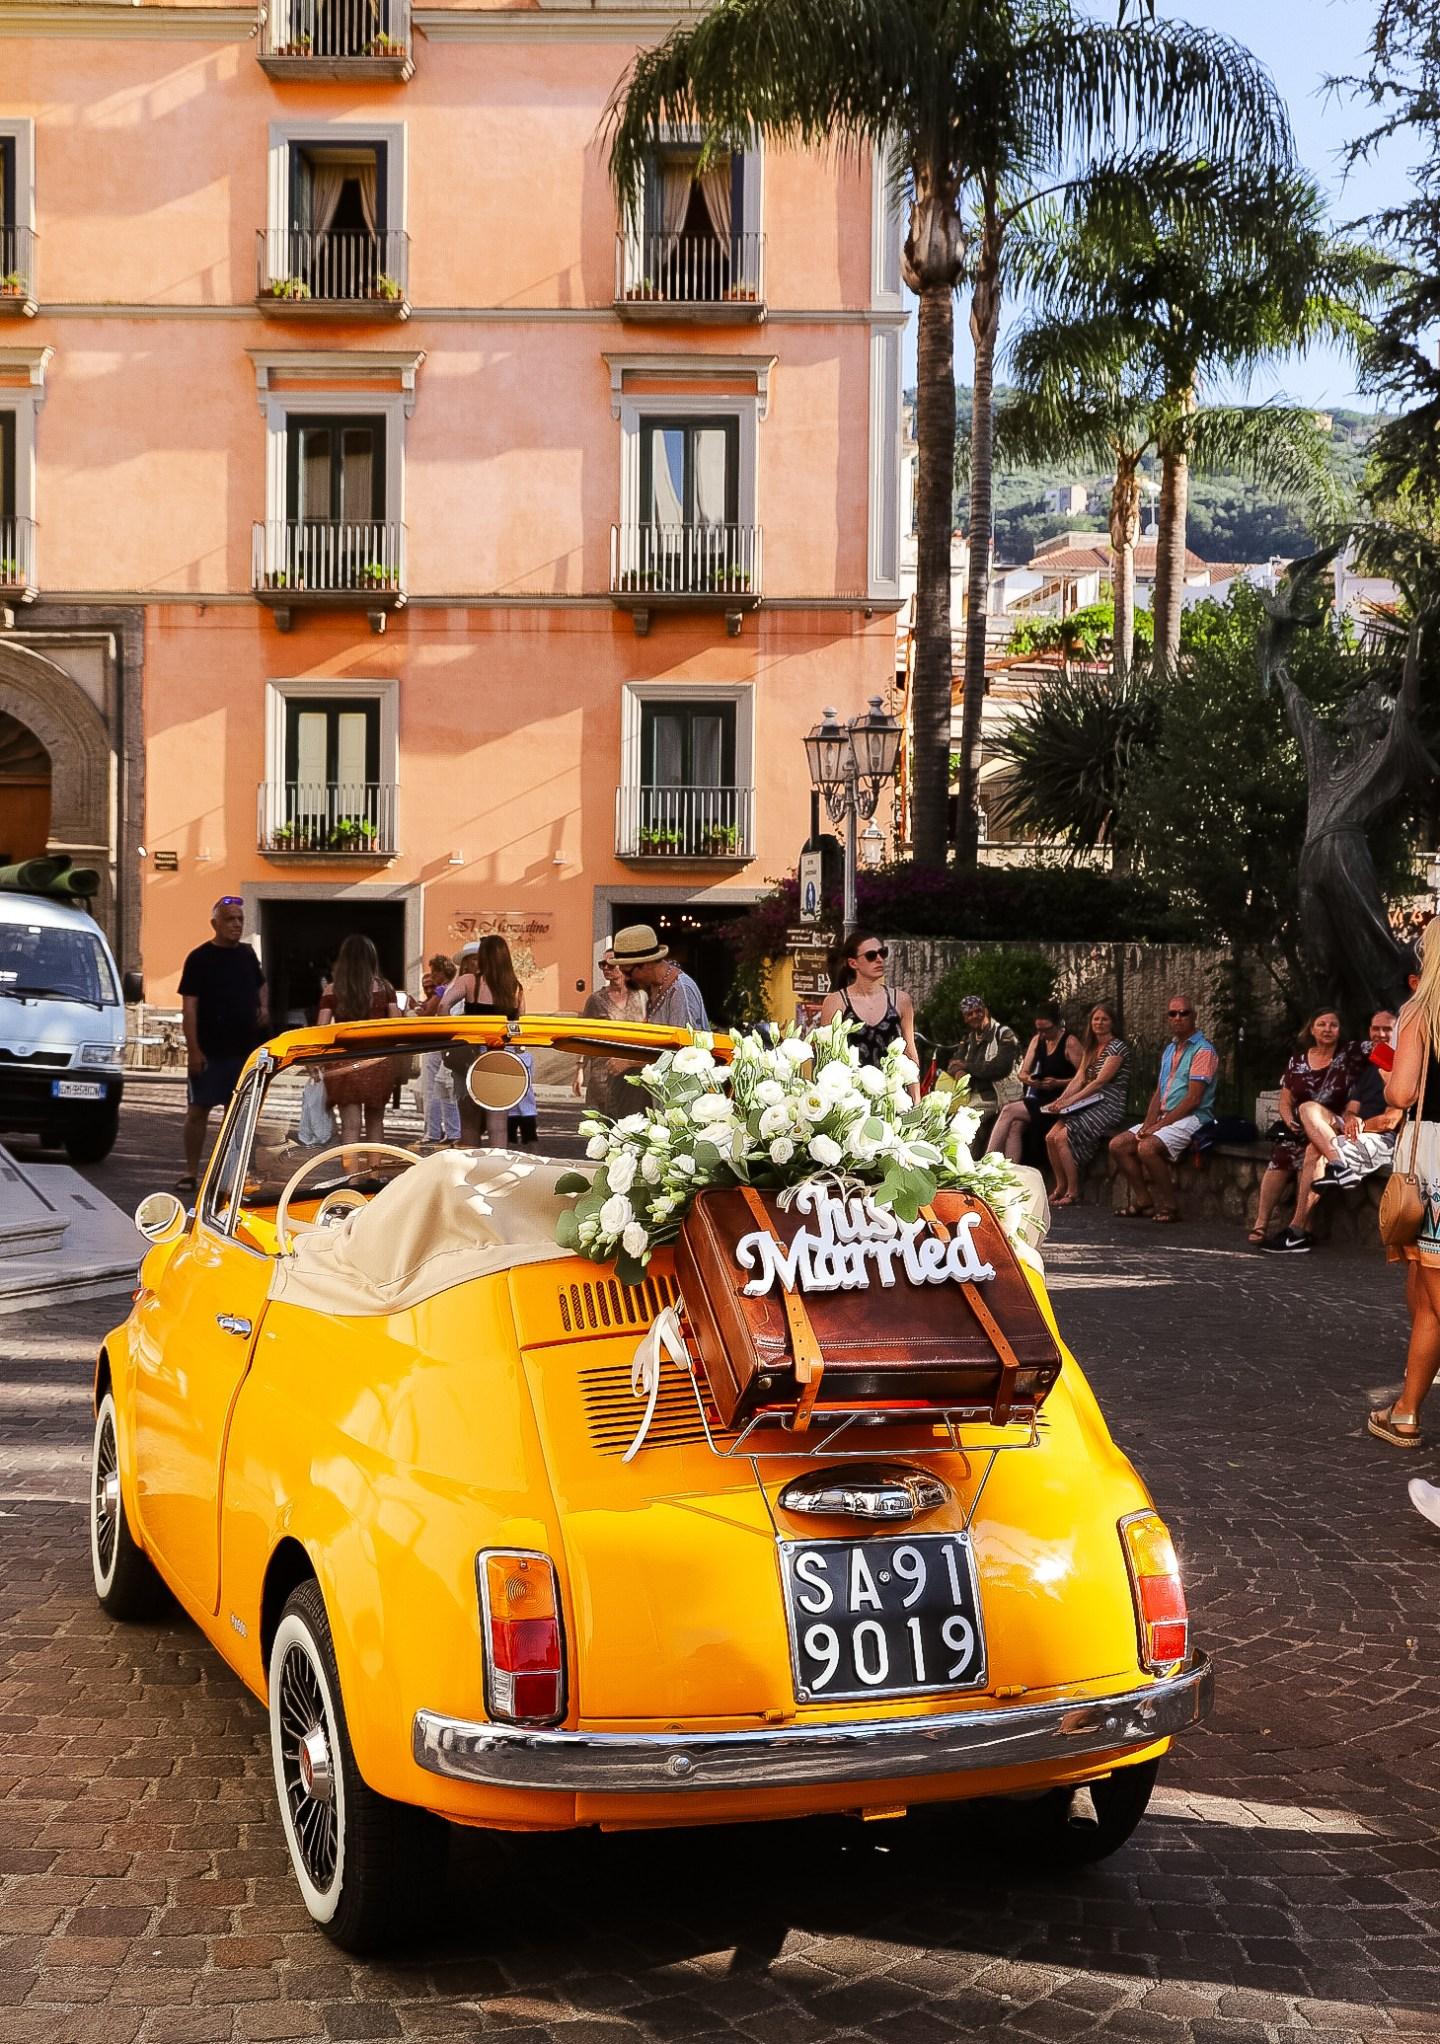 My Italian Adventure, Sorrento, Positano, Capri And More